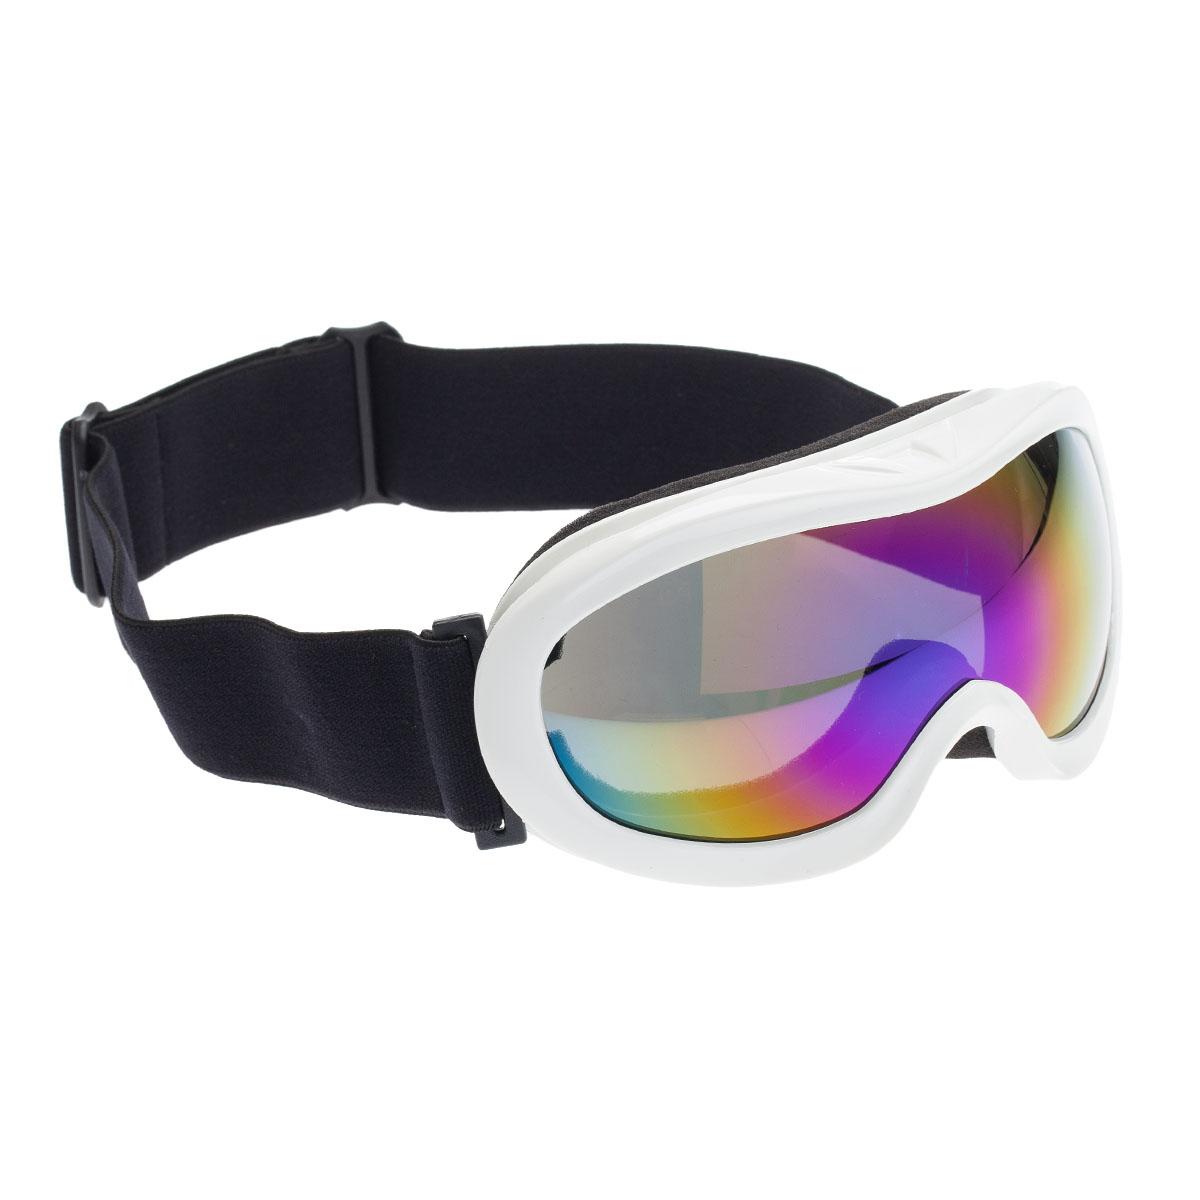 очки горнолыжные vcan ag0172 vse64 Горнолыжные очки Exparc, 15653-9